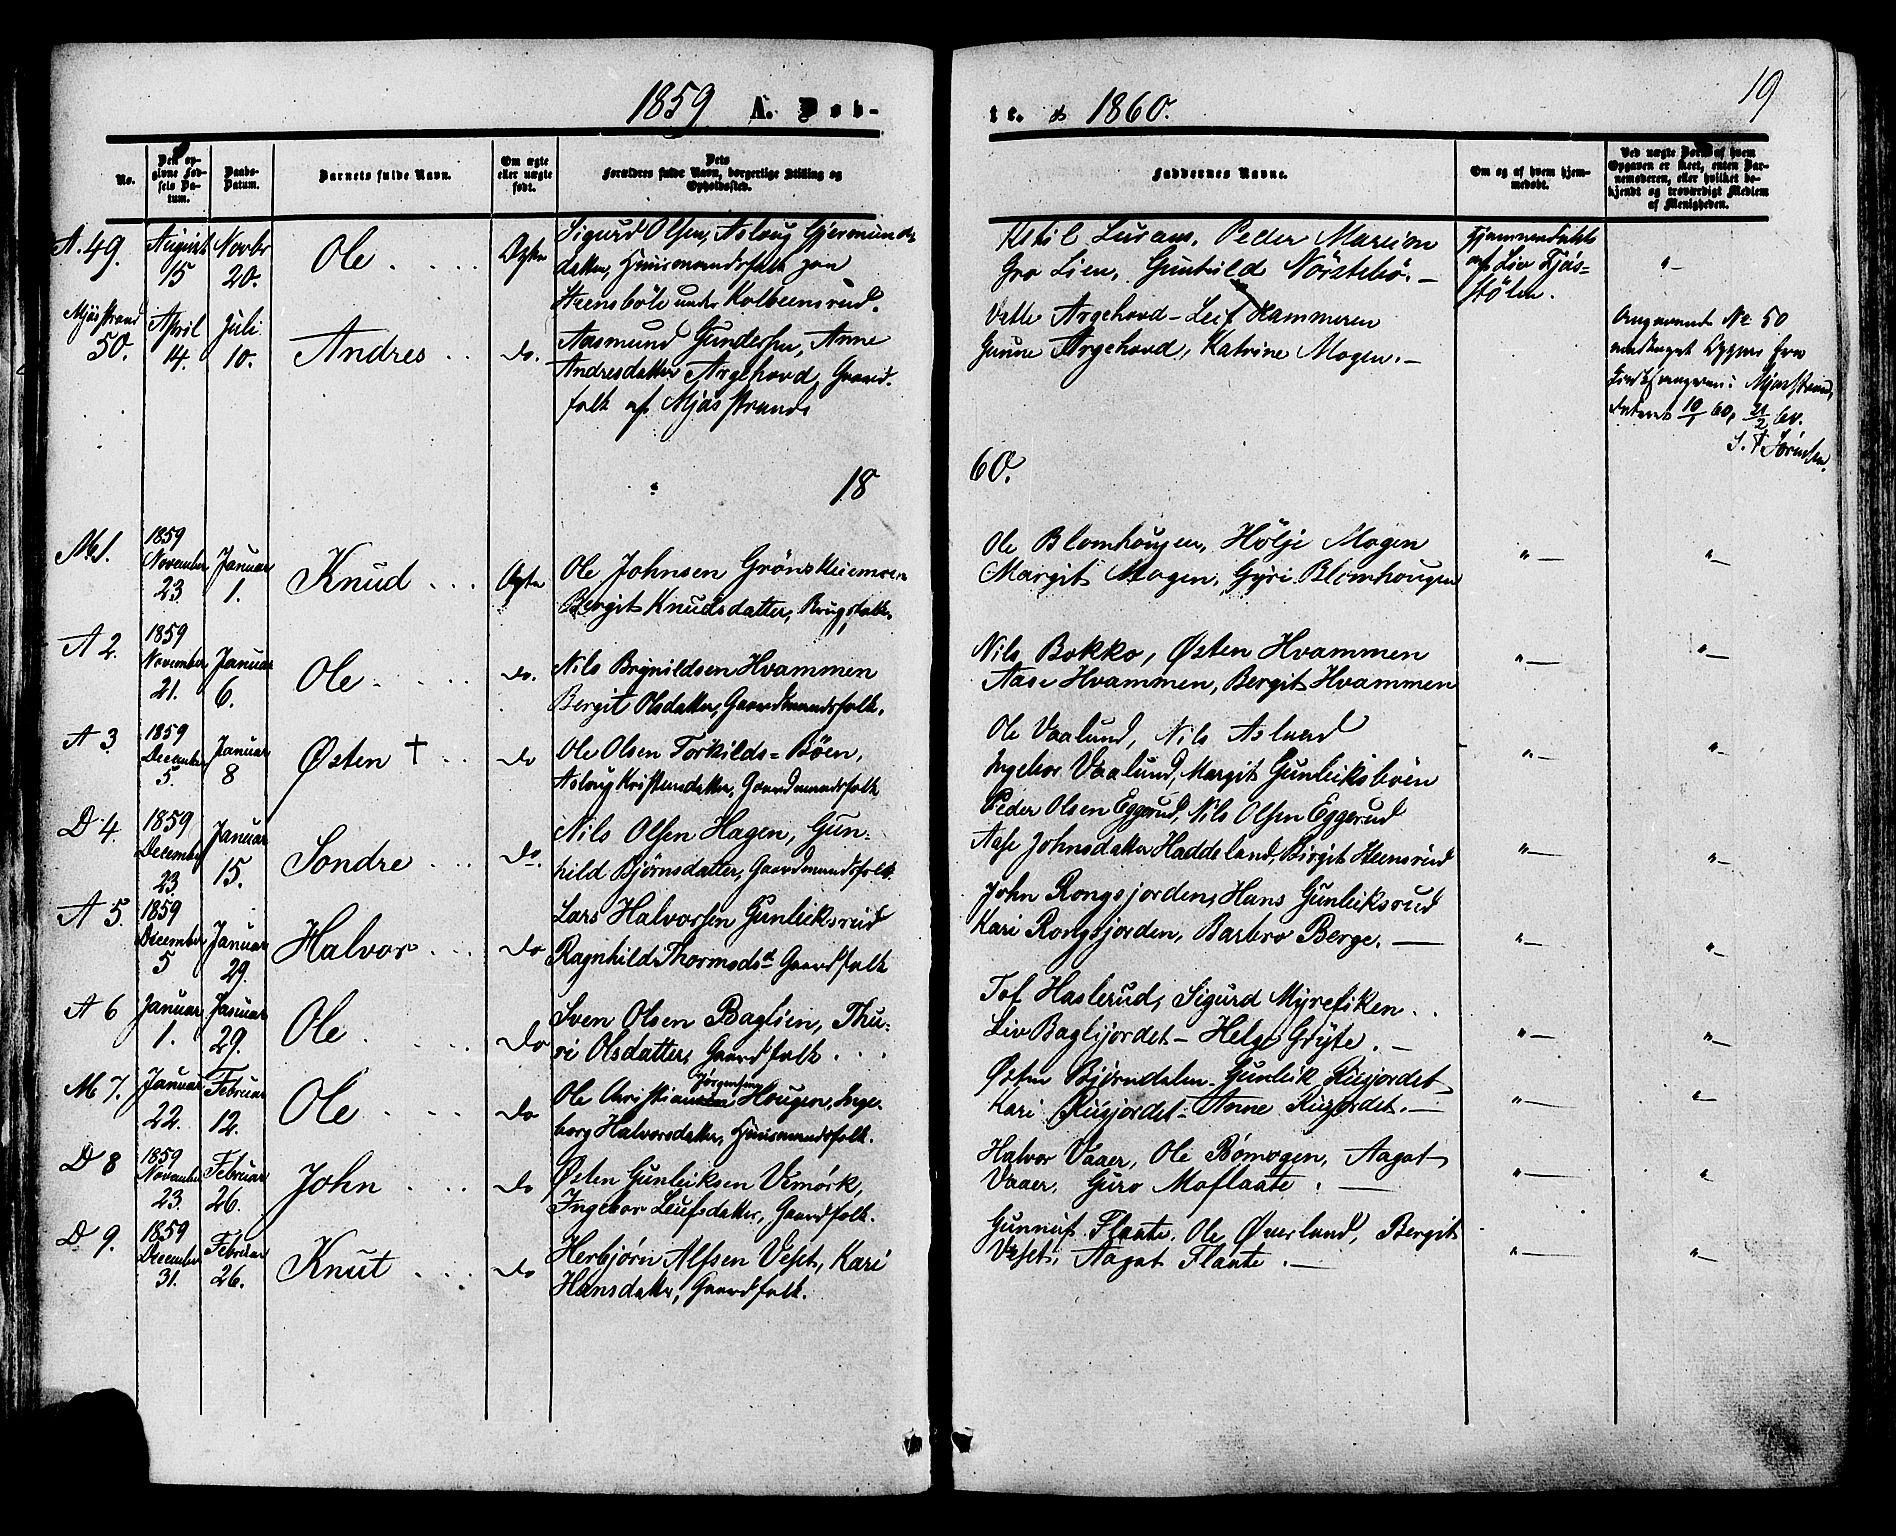 SAKO, Tinn kirkebøker, F/Fa/L0006: Ministerialbok nr. I 6, 1857-1878, s. 19